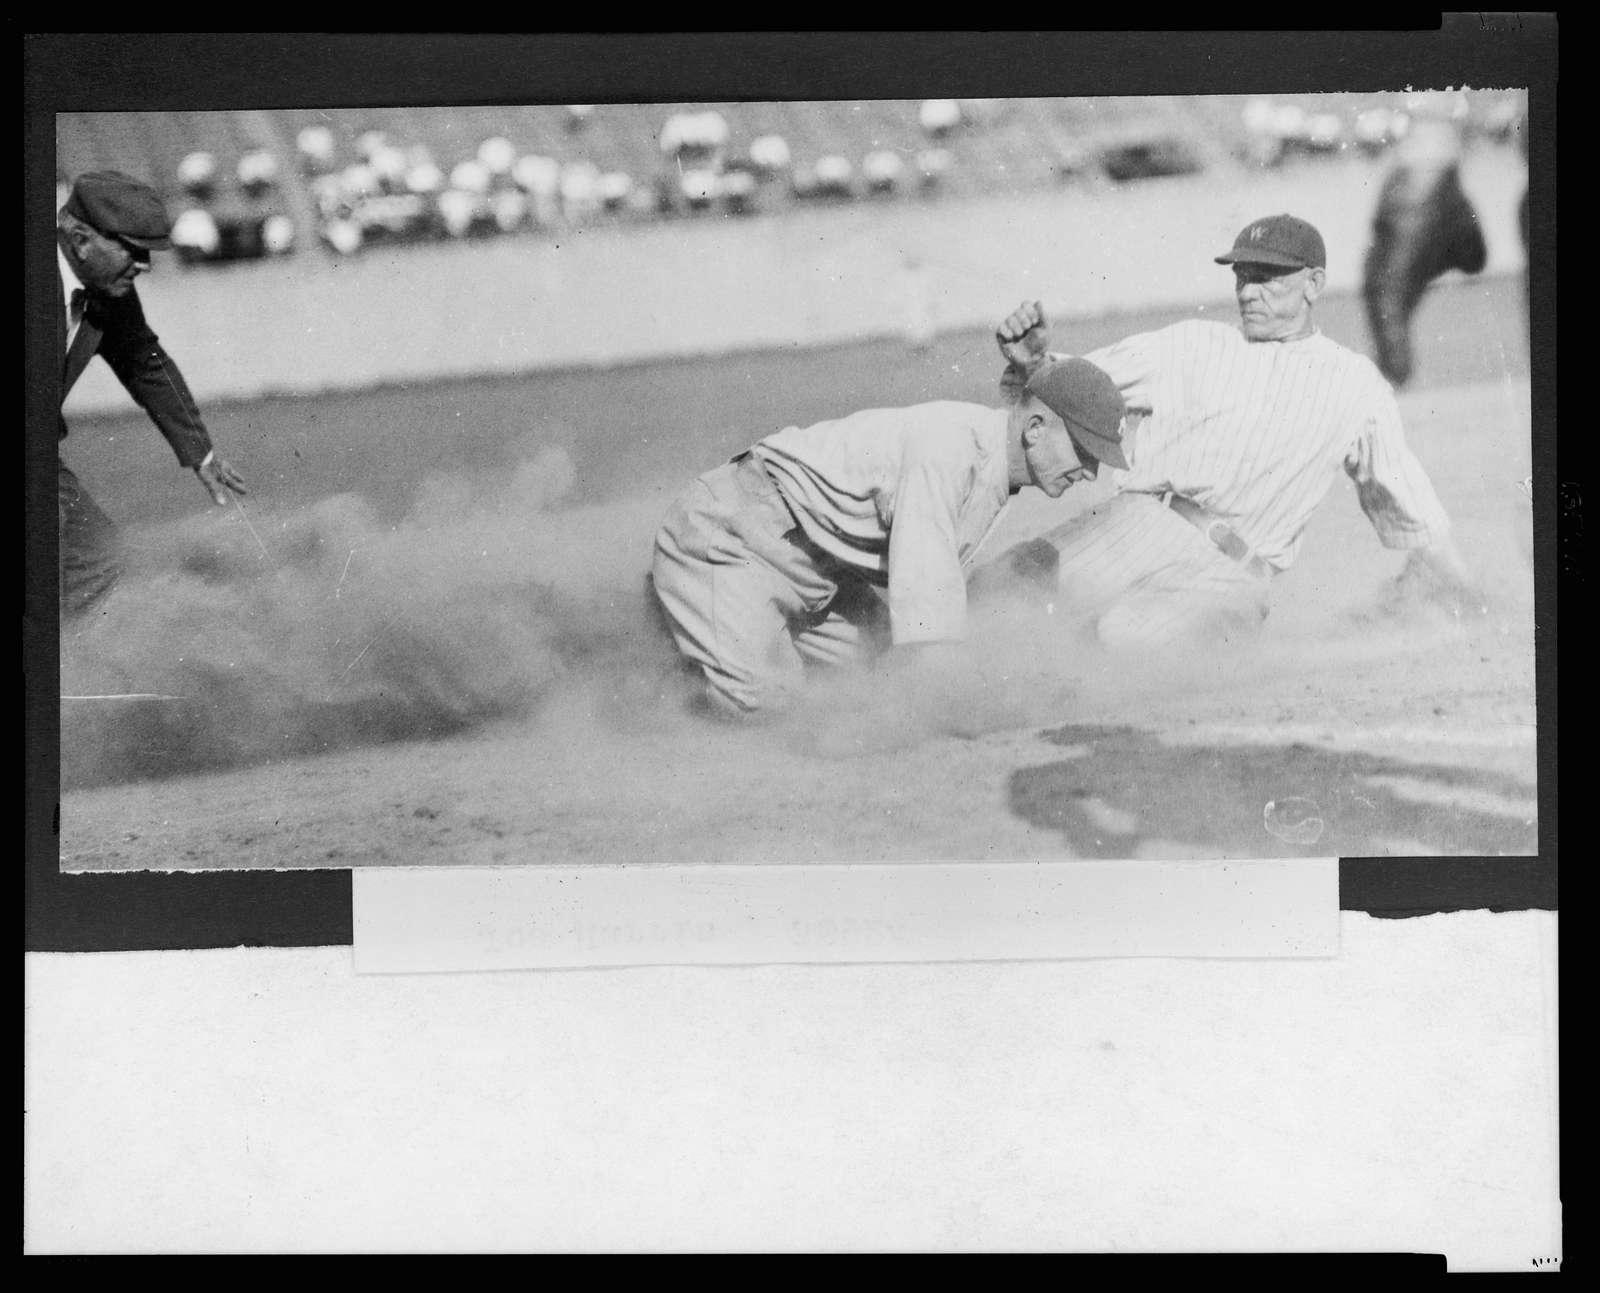 [Joe Harris, of the Washington National, sliding safely into 3rd base during a baseball game]